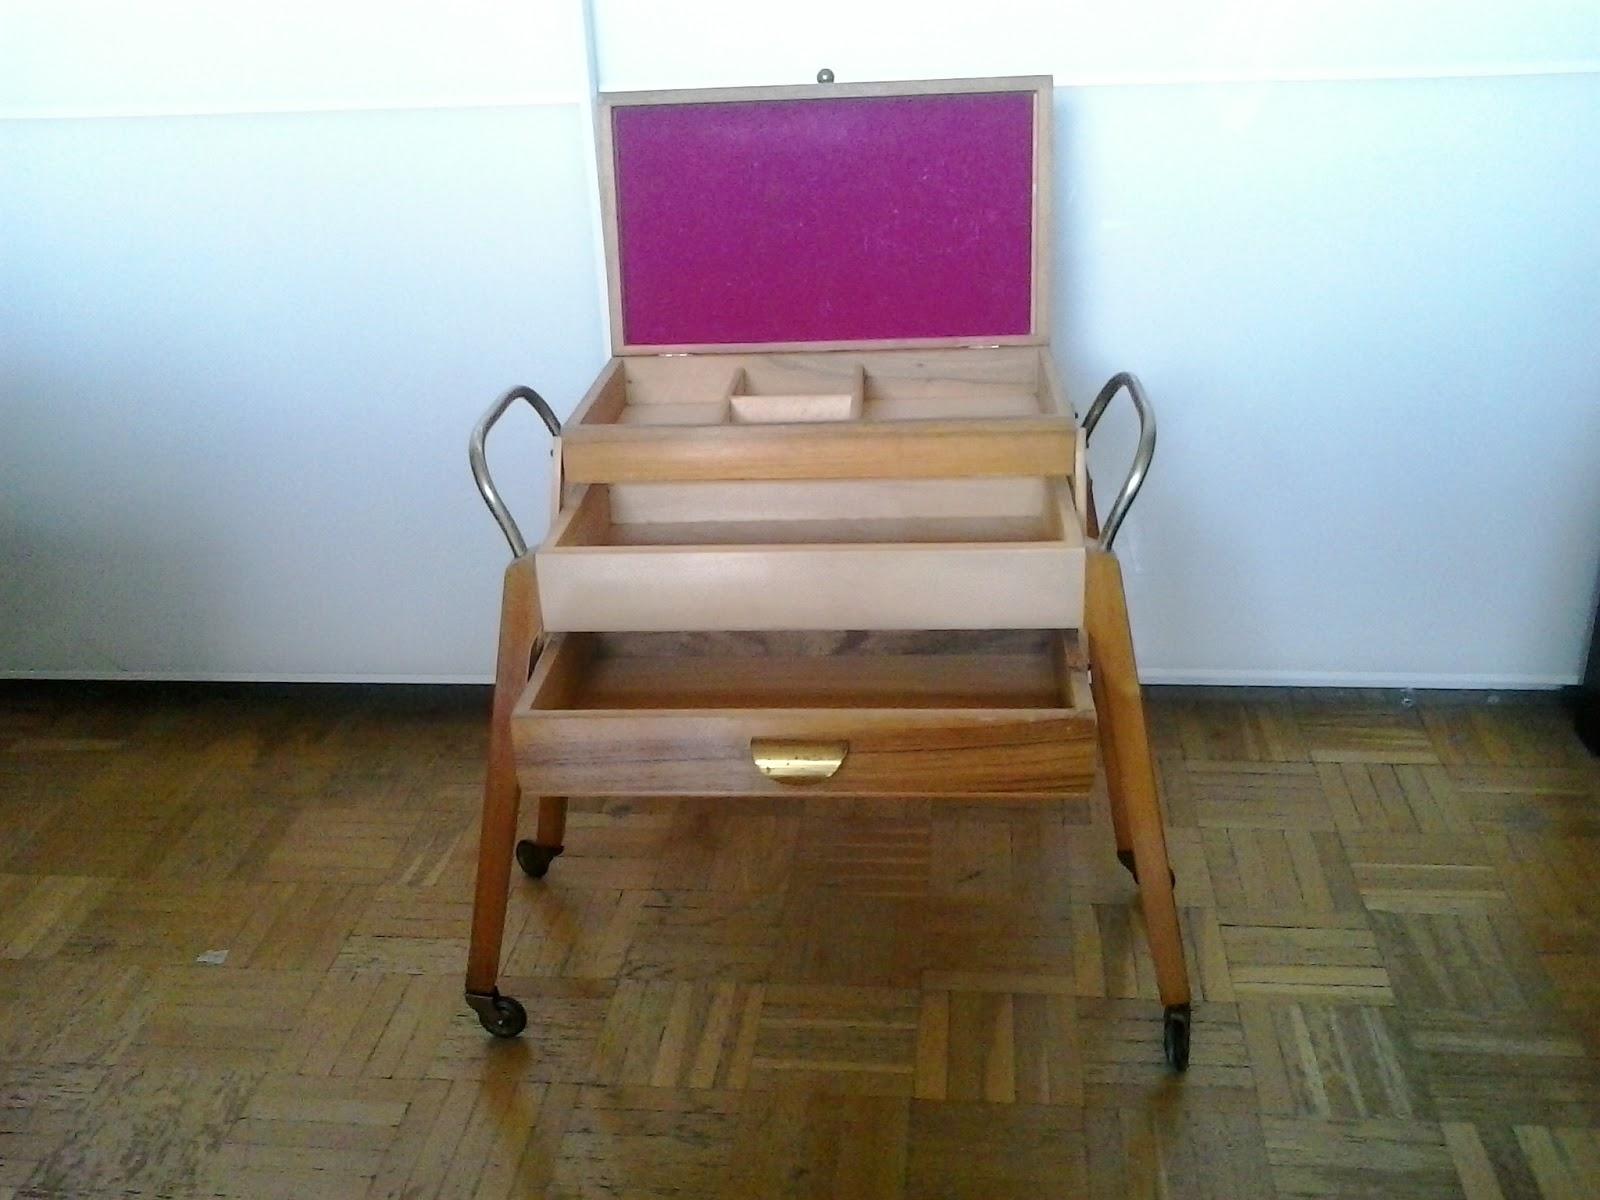 Area vintage dise o mueble auxiliar dise o a os 50 - Muebles anos 50 ...